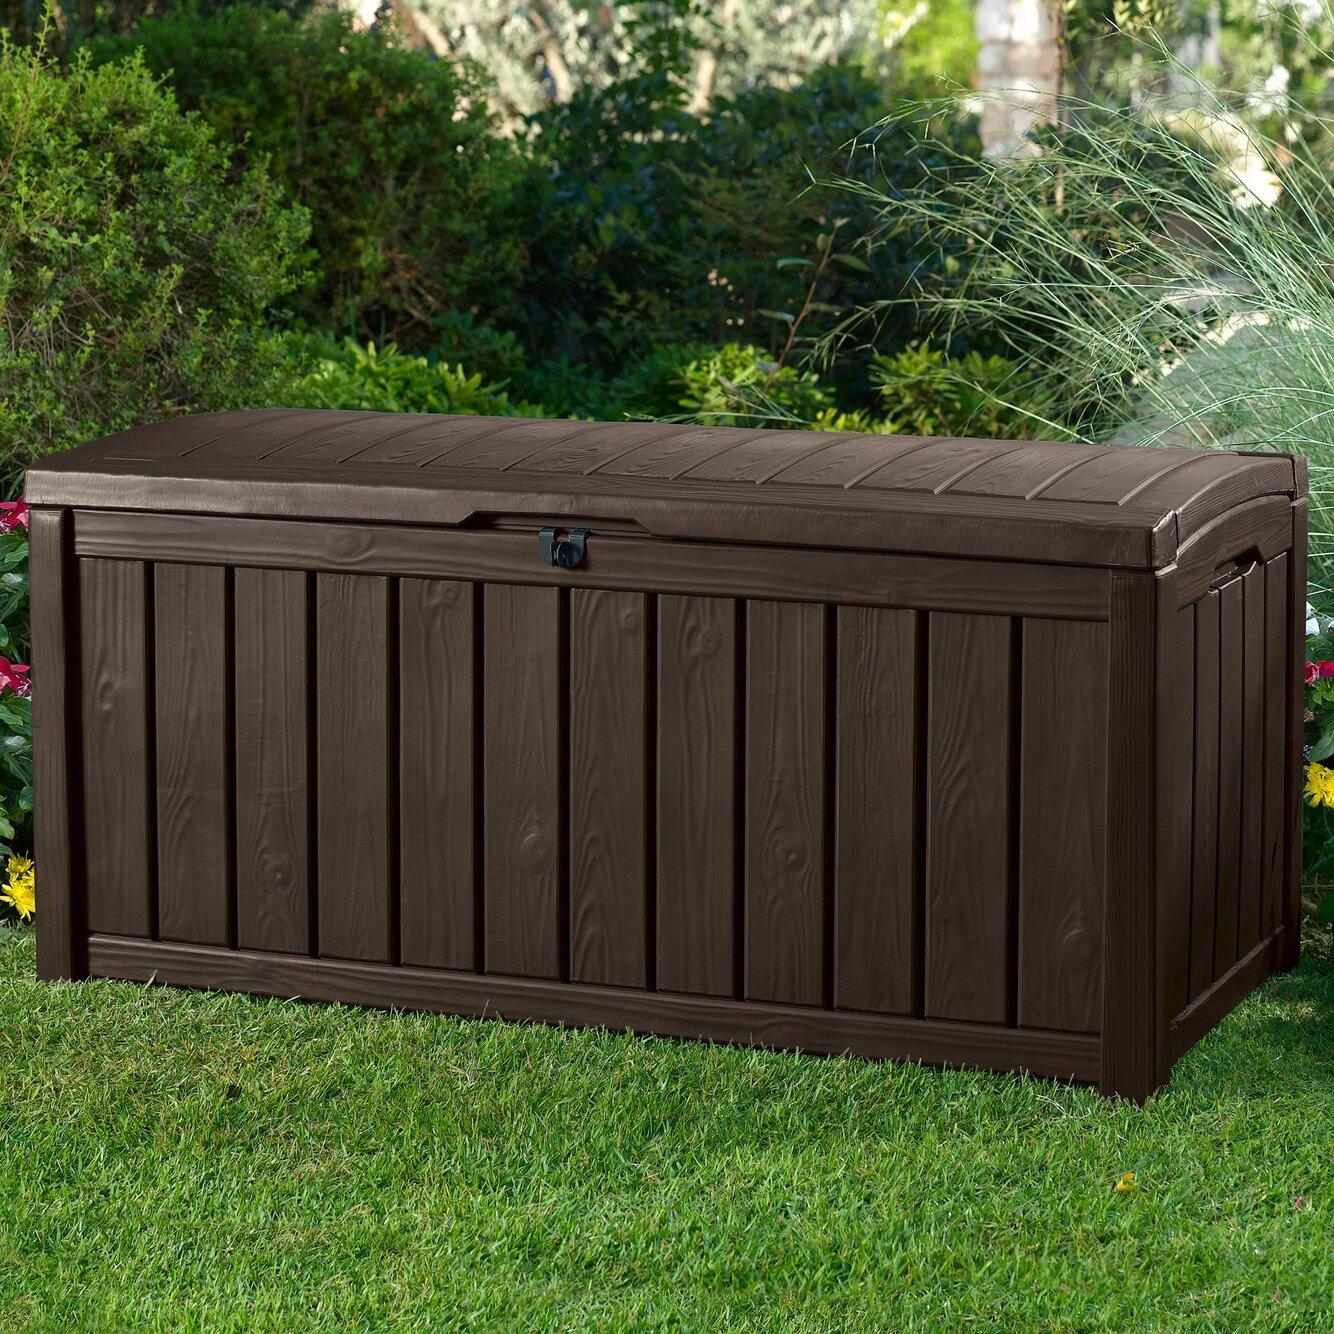 Keter Glenwood Outdoor Patio Furniture 101 Gallon Plastic